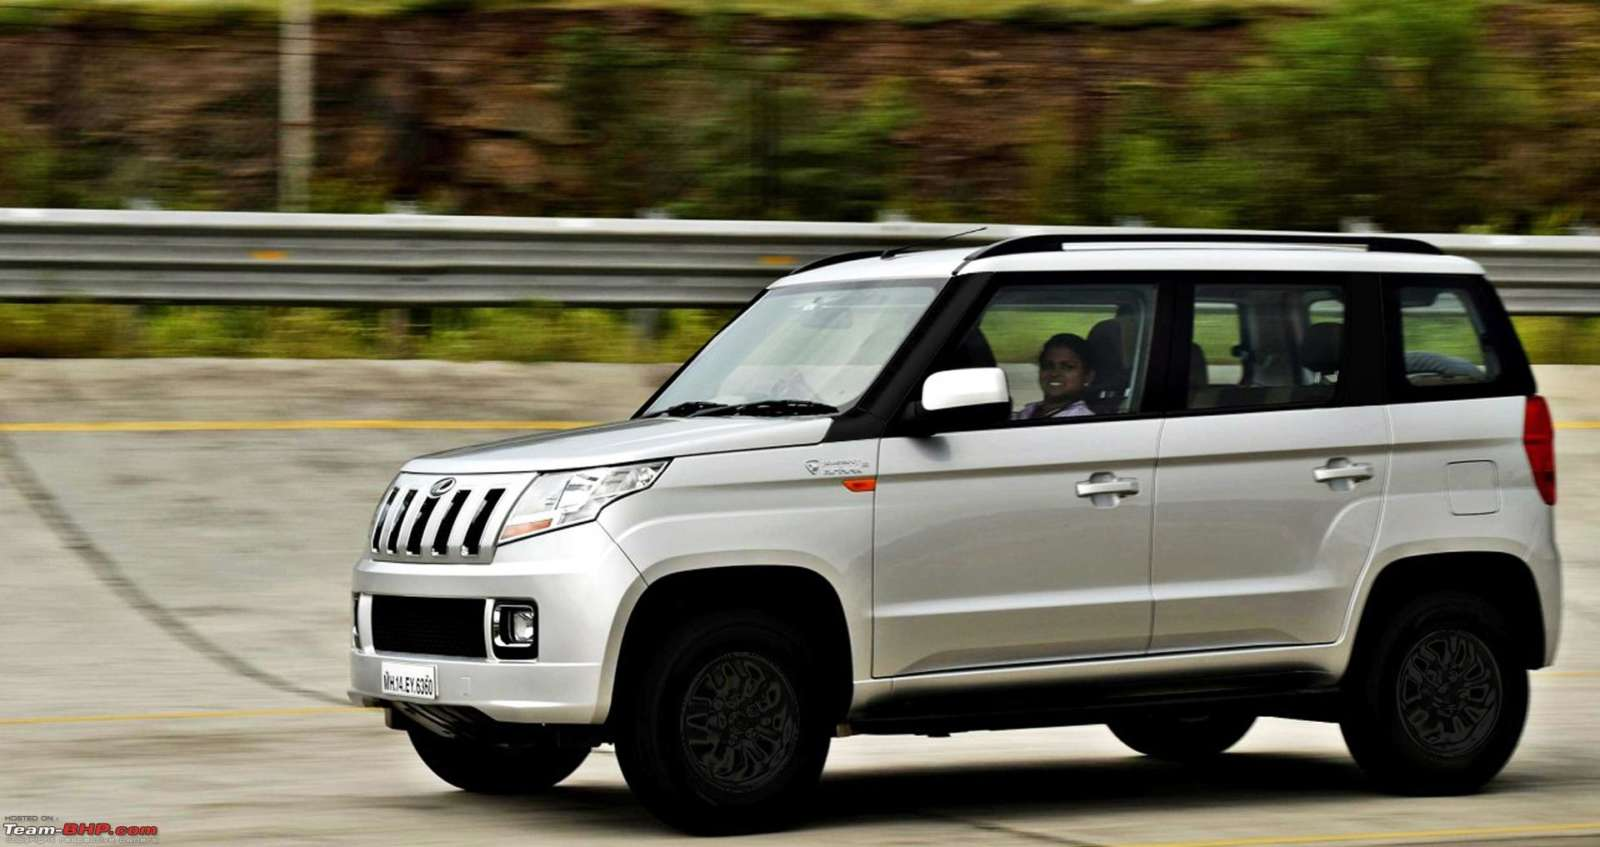 Renders Mahindra Tuv300 Modifications That Make It Look